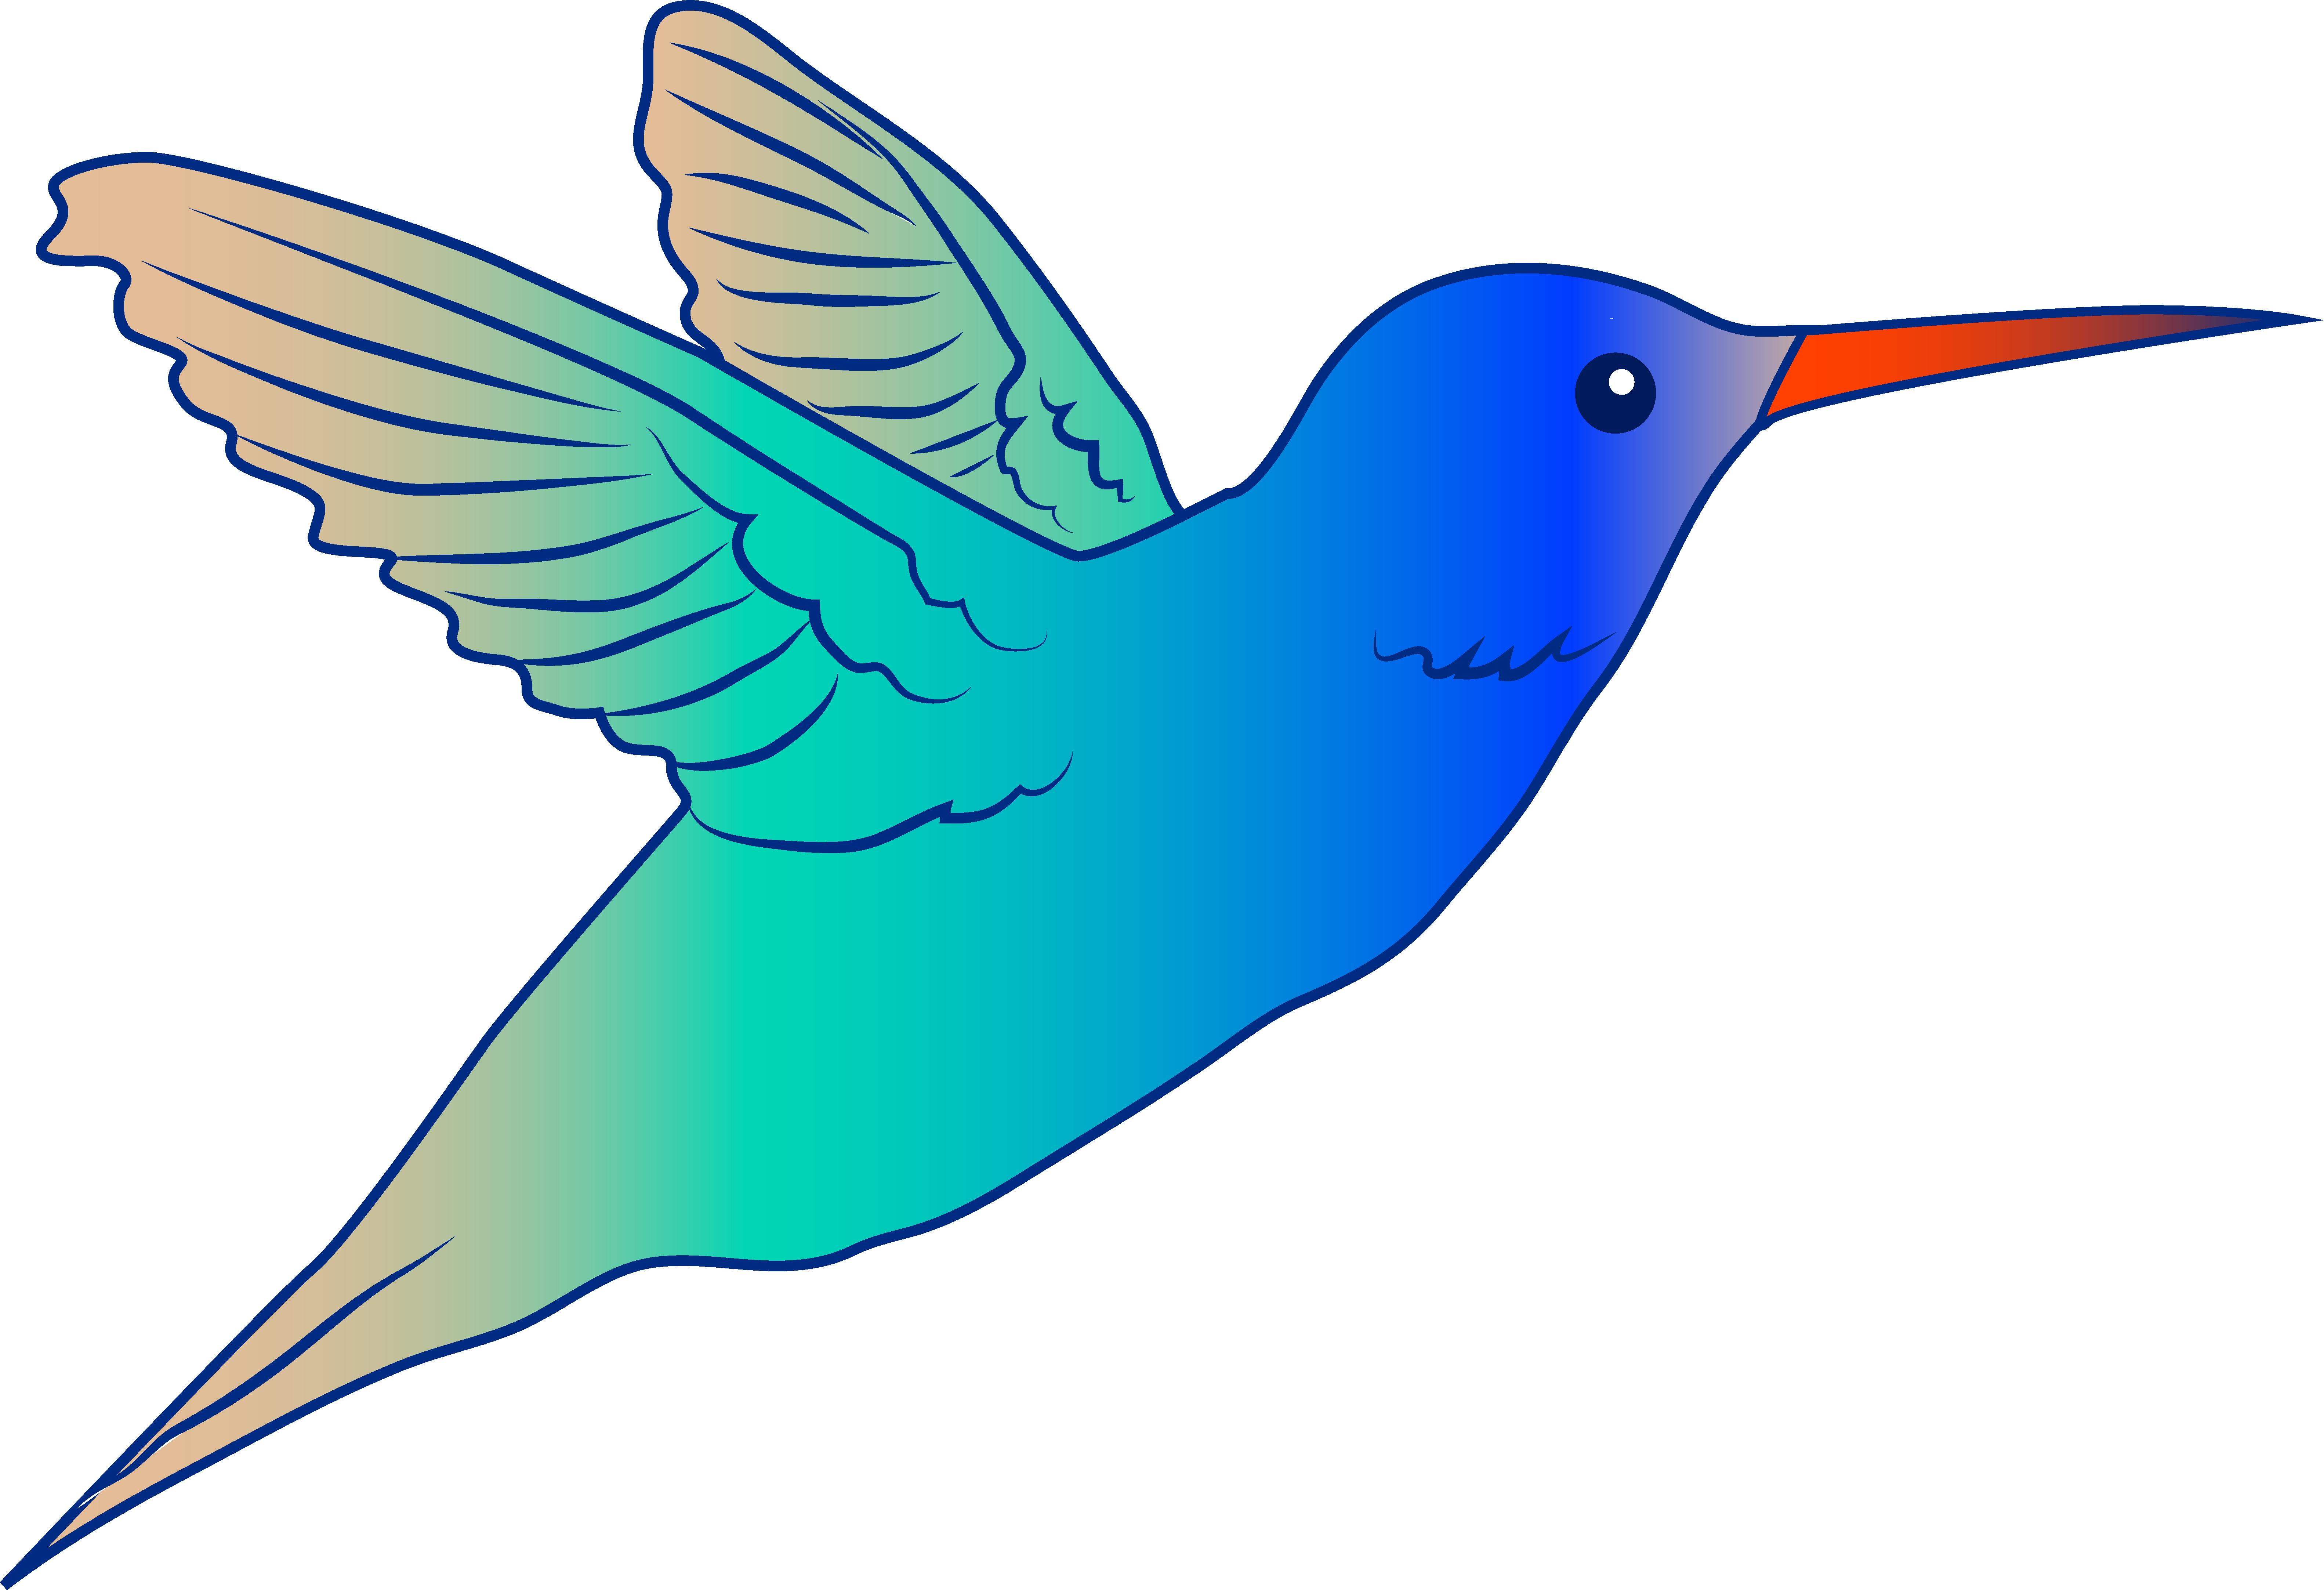 Hummingbird clipart #3, Download drawings